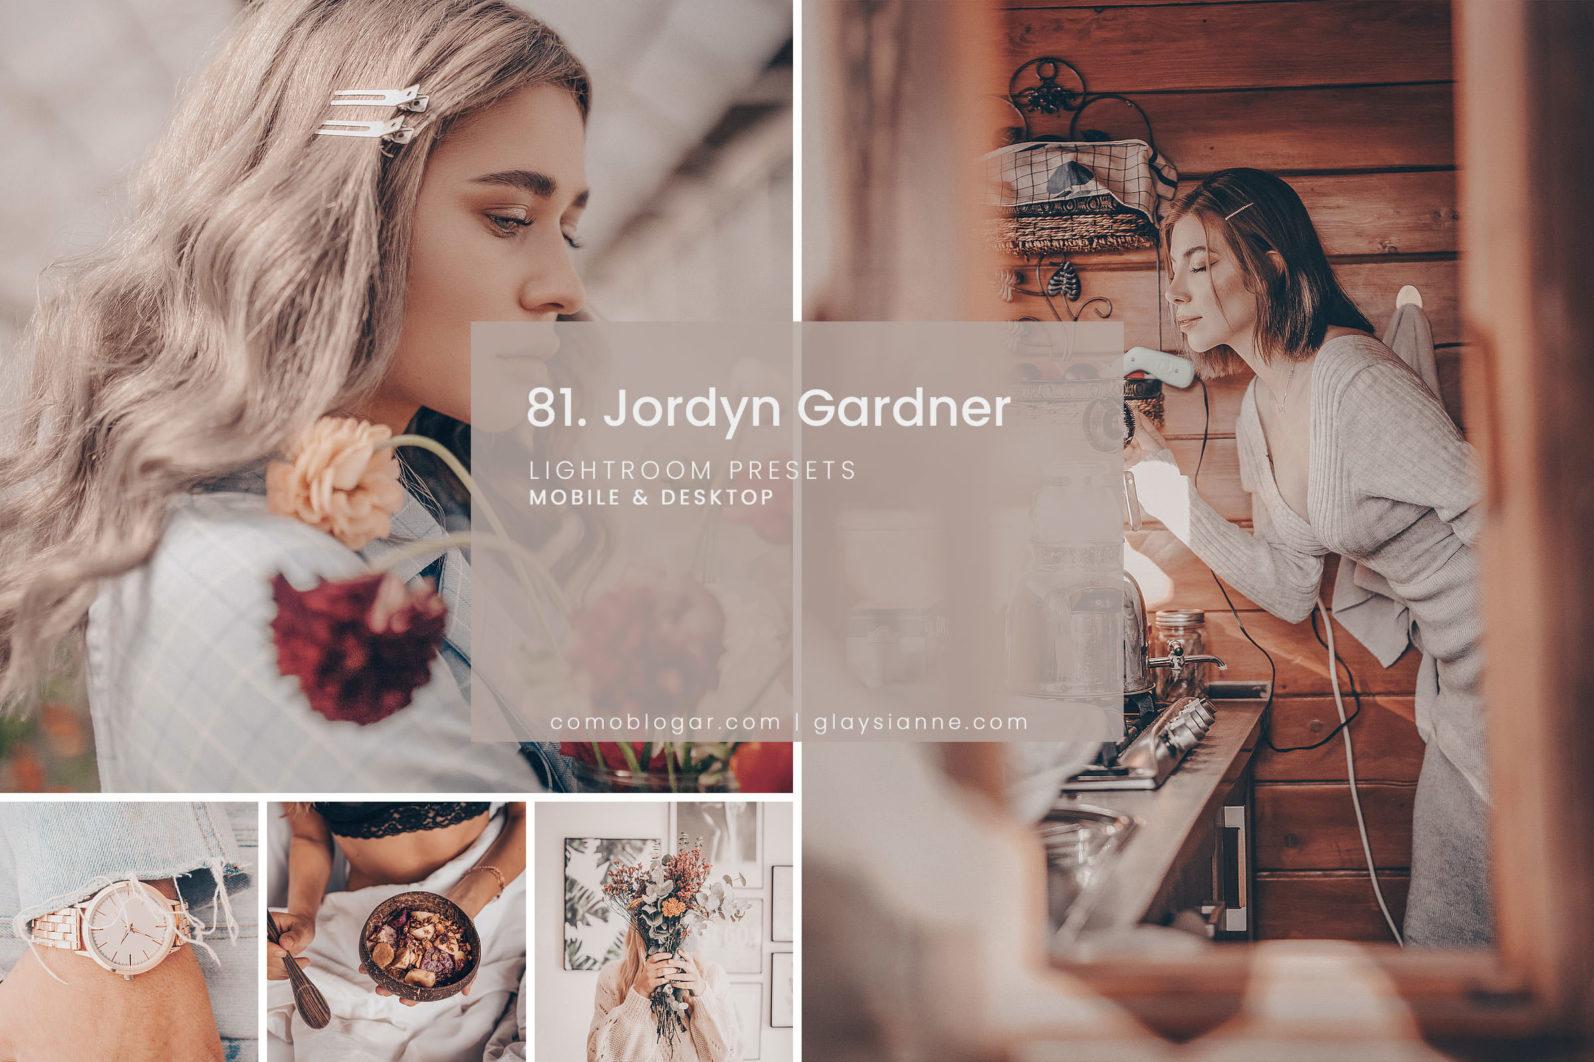 81. Jordyn Gardner Presets - 81.Jordyn Gardner 01 -